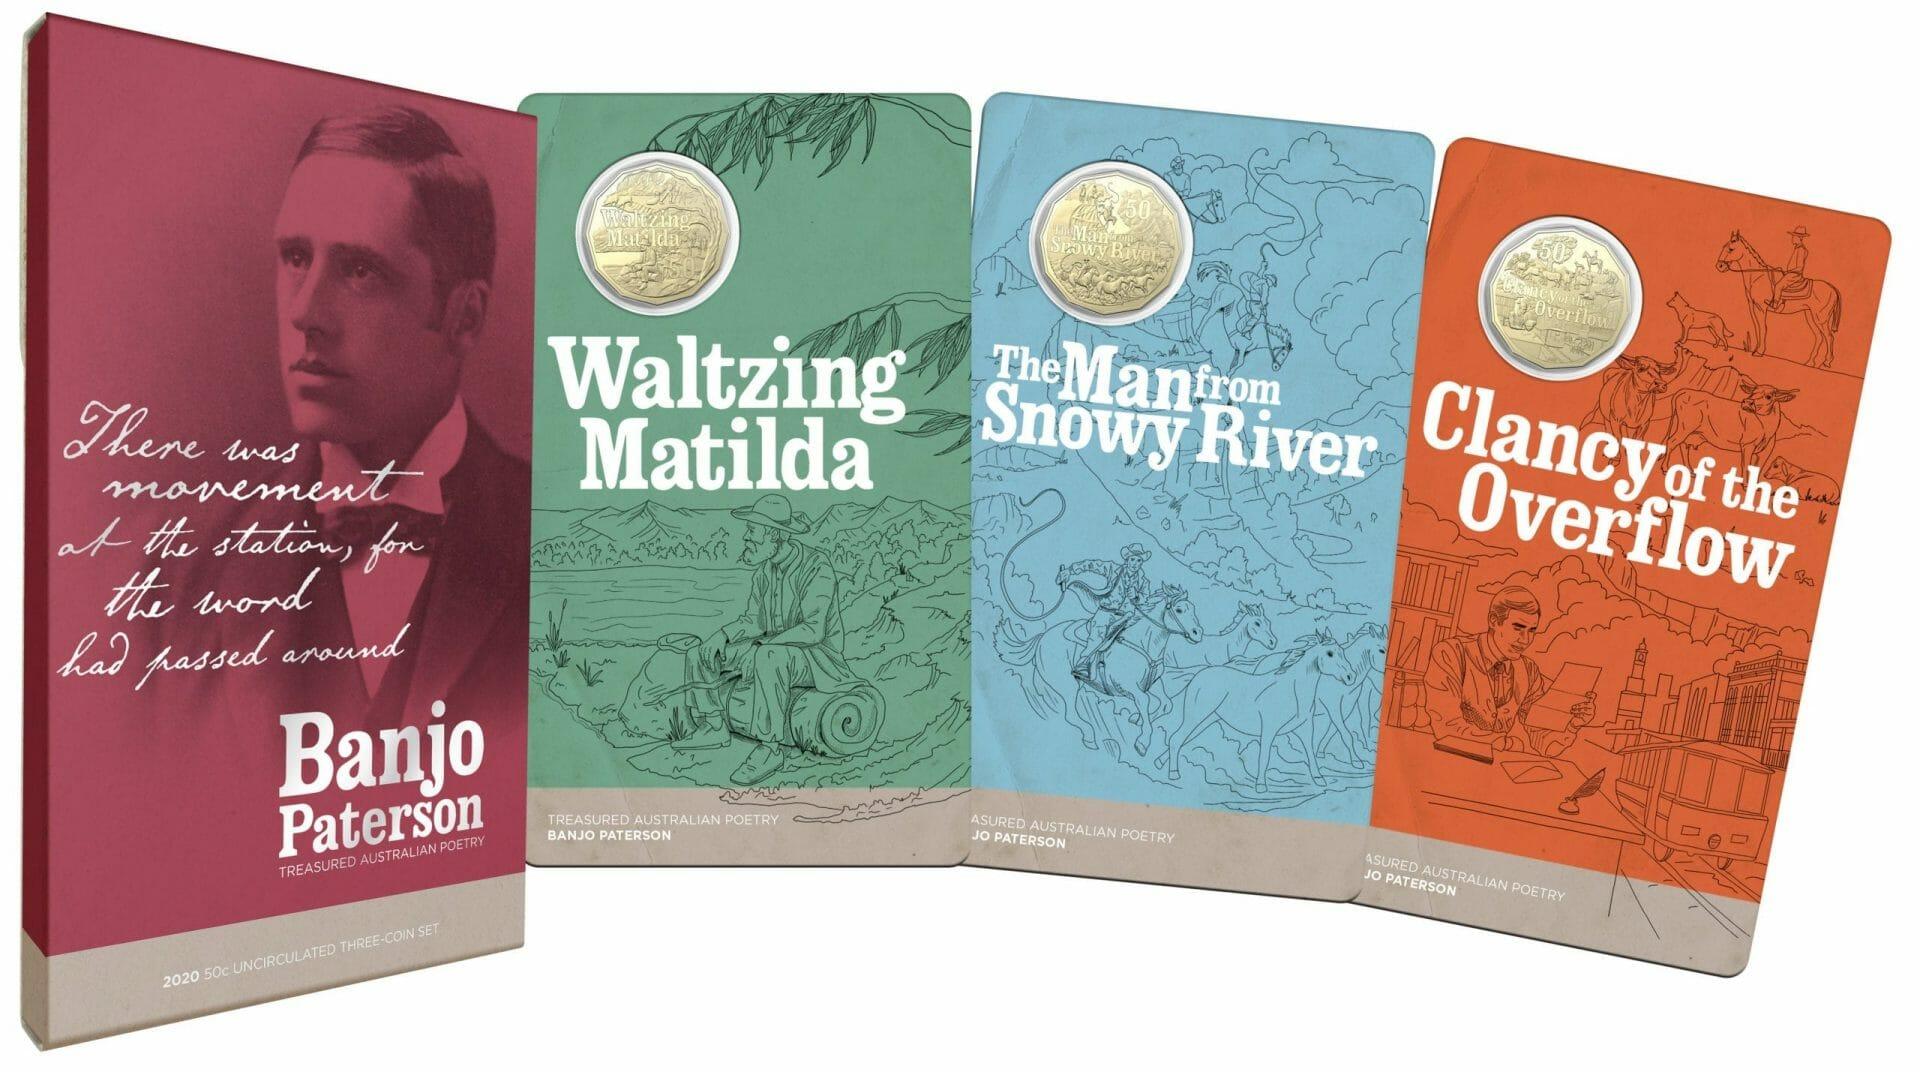 2020 50c Banjo Paterson - Treasured Australian Poetry Uncirculated Three Coin Set - AlBr 3